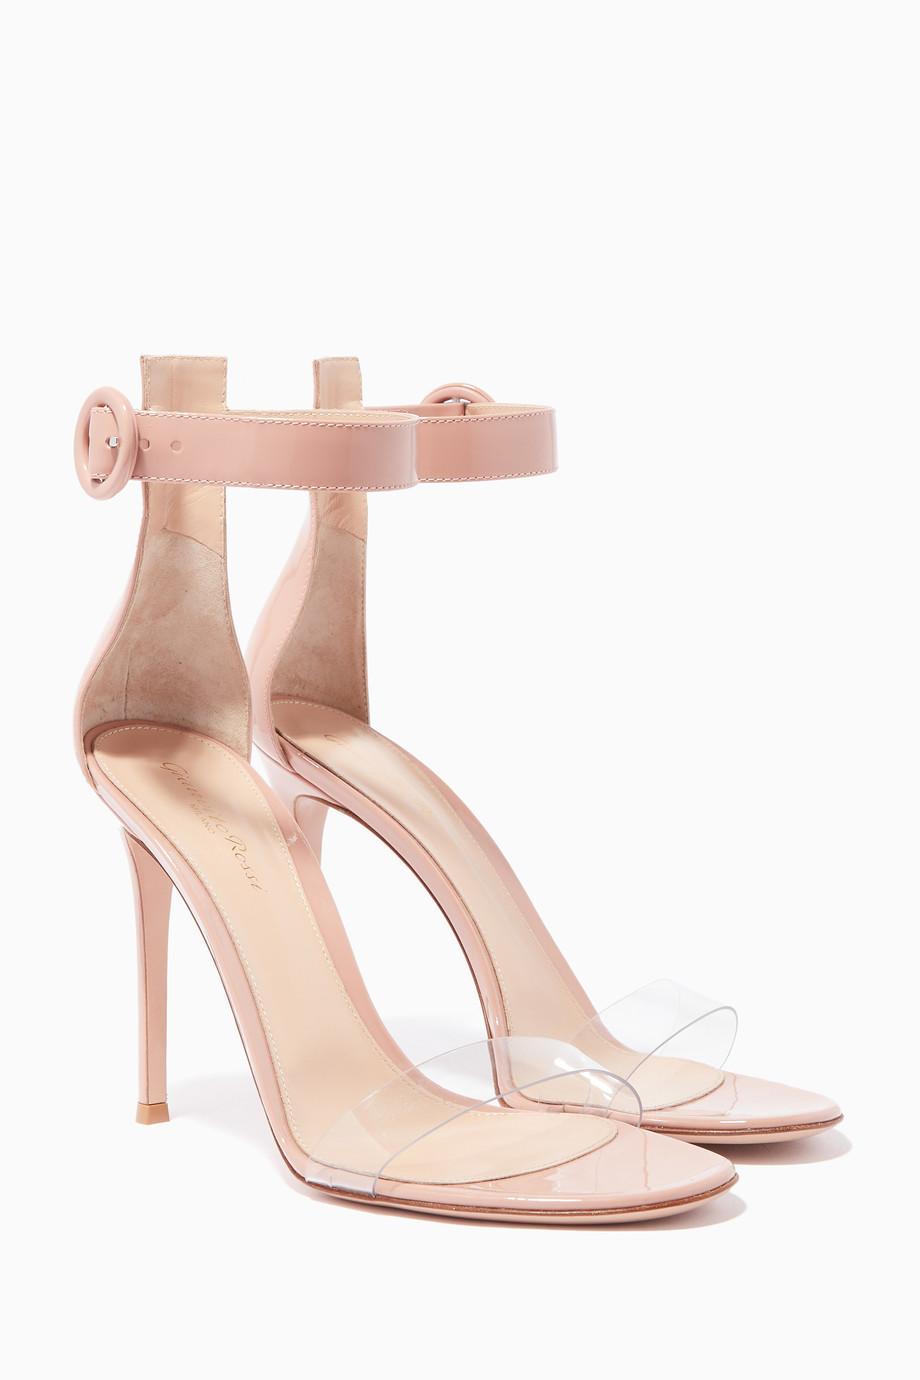 939877ad01c Shop Gianvito Rossi Pink Dahlia-Pink Leather   PVC Portofino Sandals ...